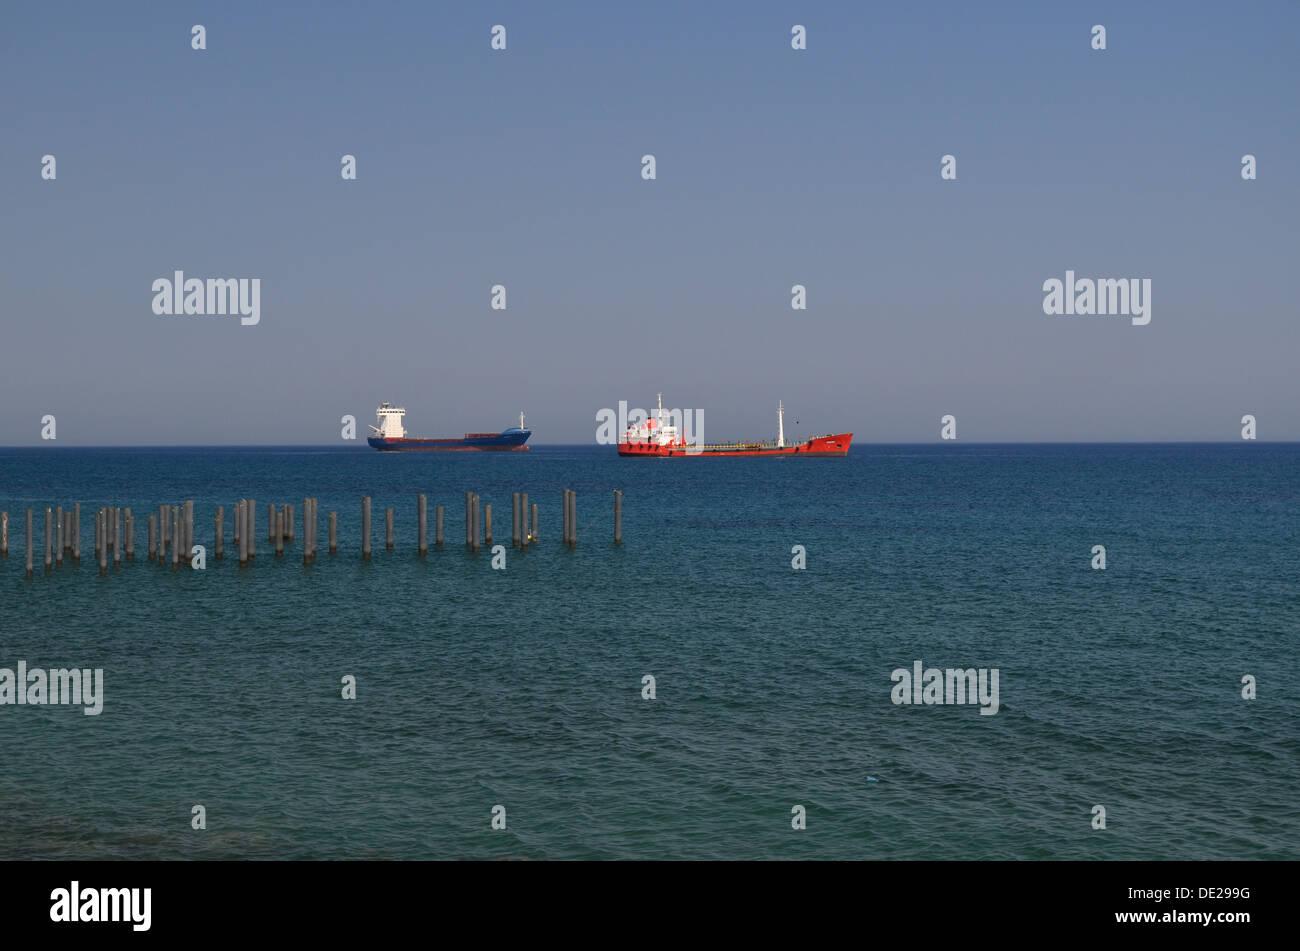 Ships near Limassol port - Stock Image